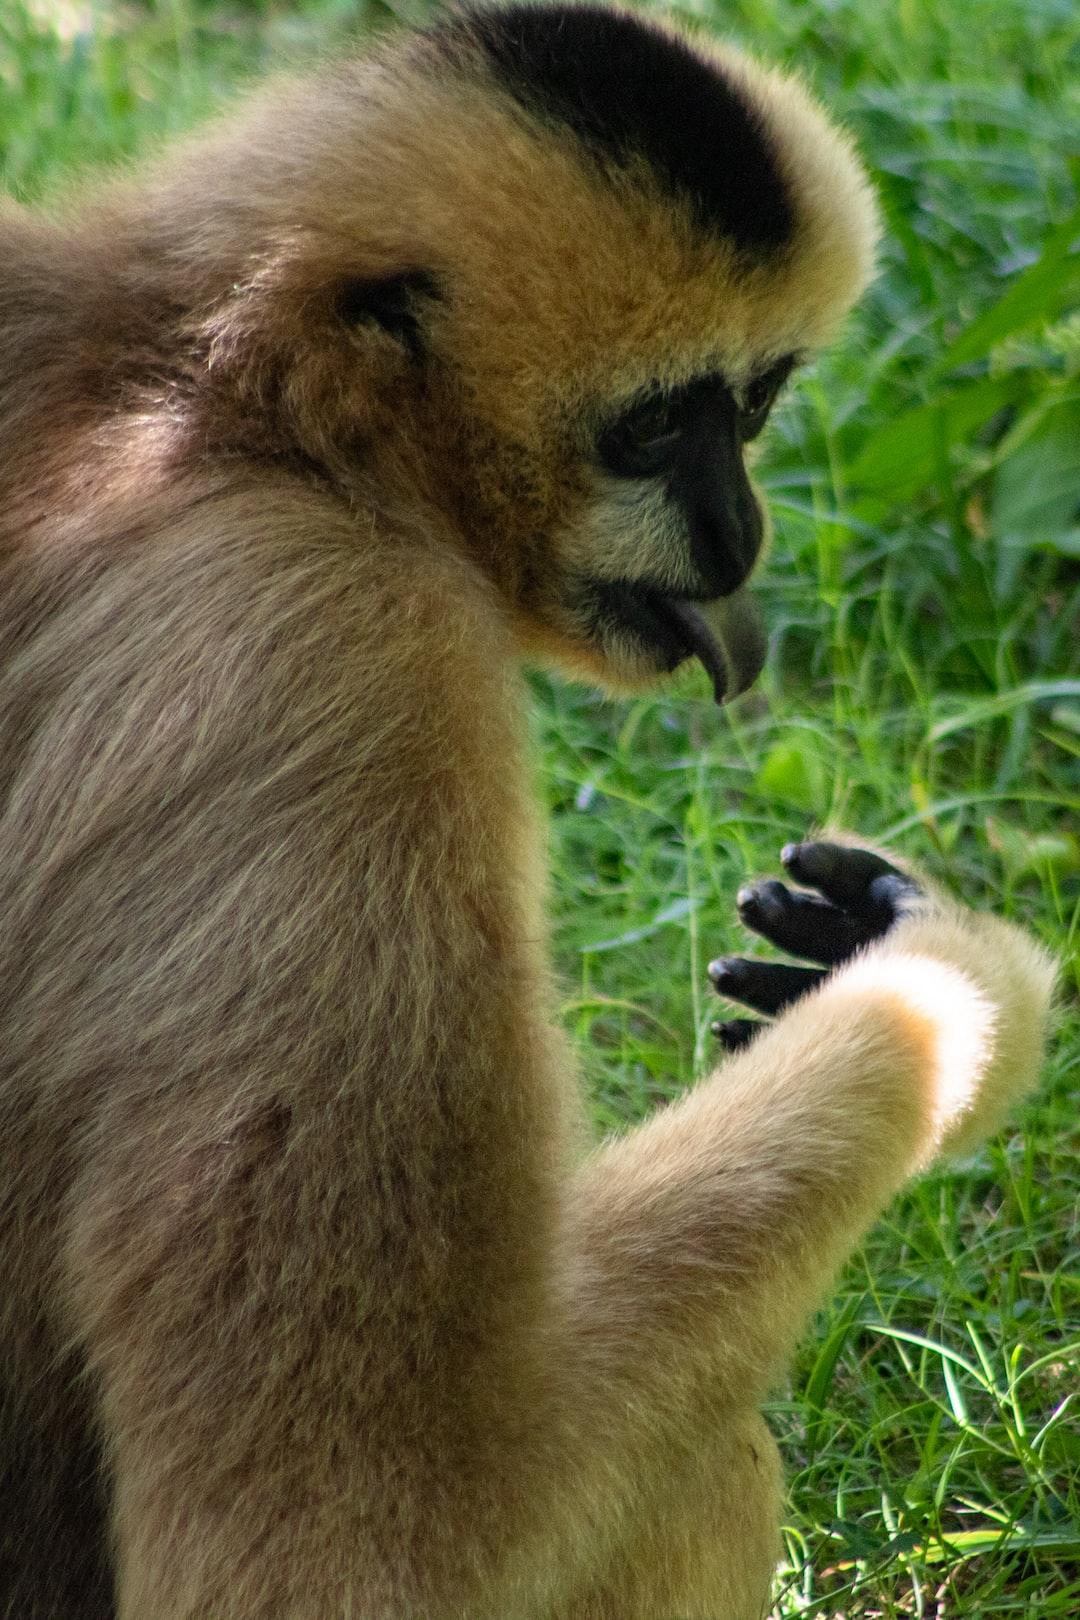 A gibbon sticks his tongue out.